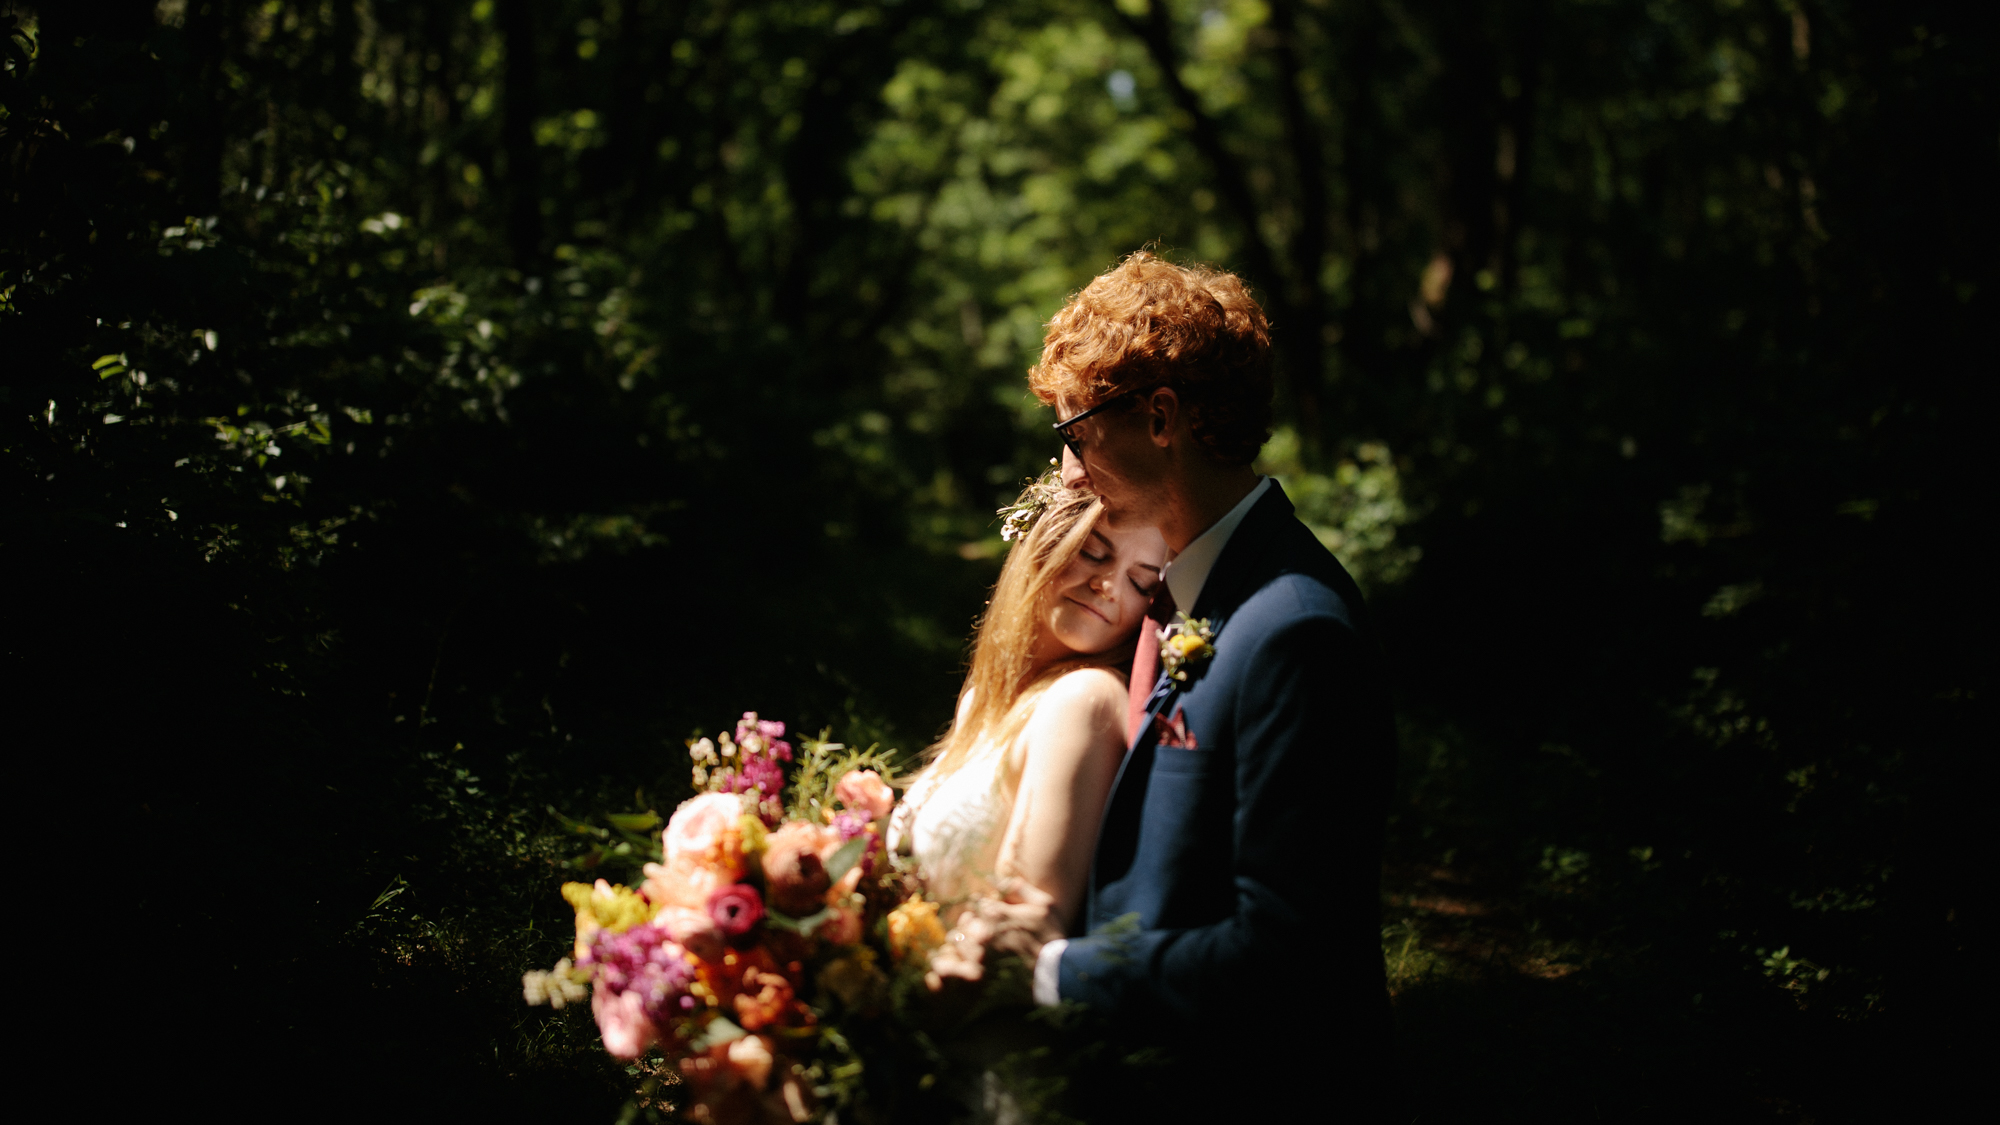 alec_vanderboom_kansas_city_mo_wedding_photos-0087.jpg